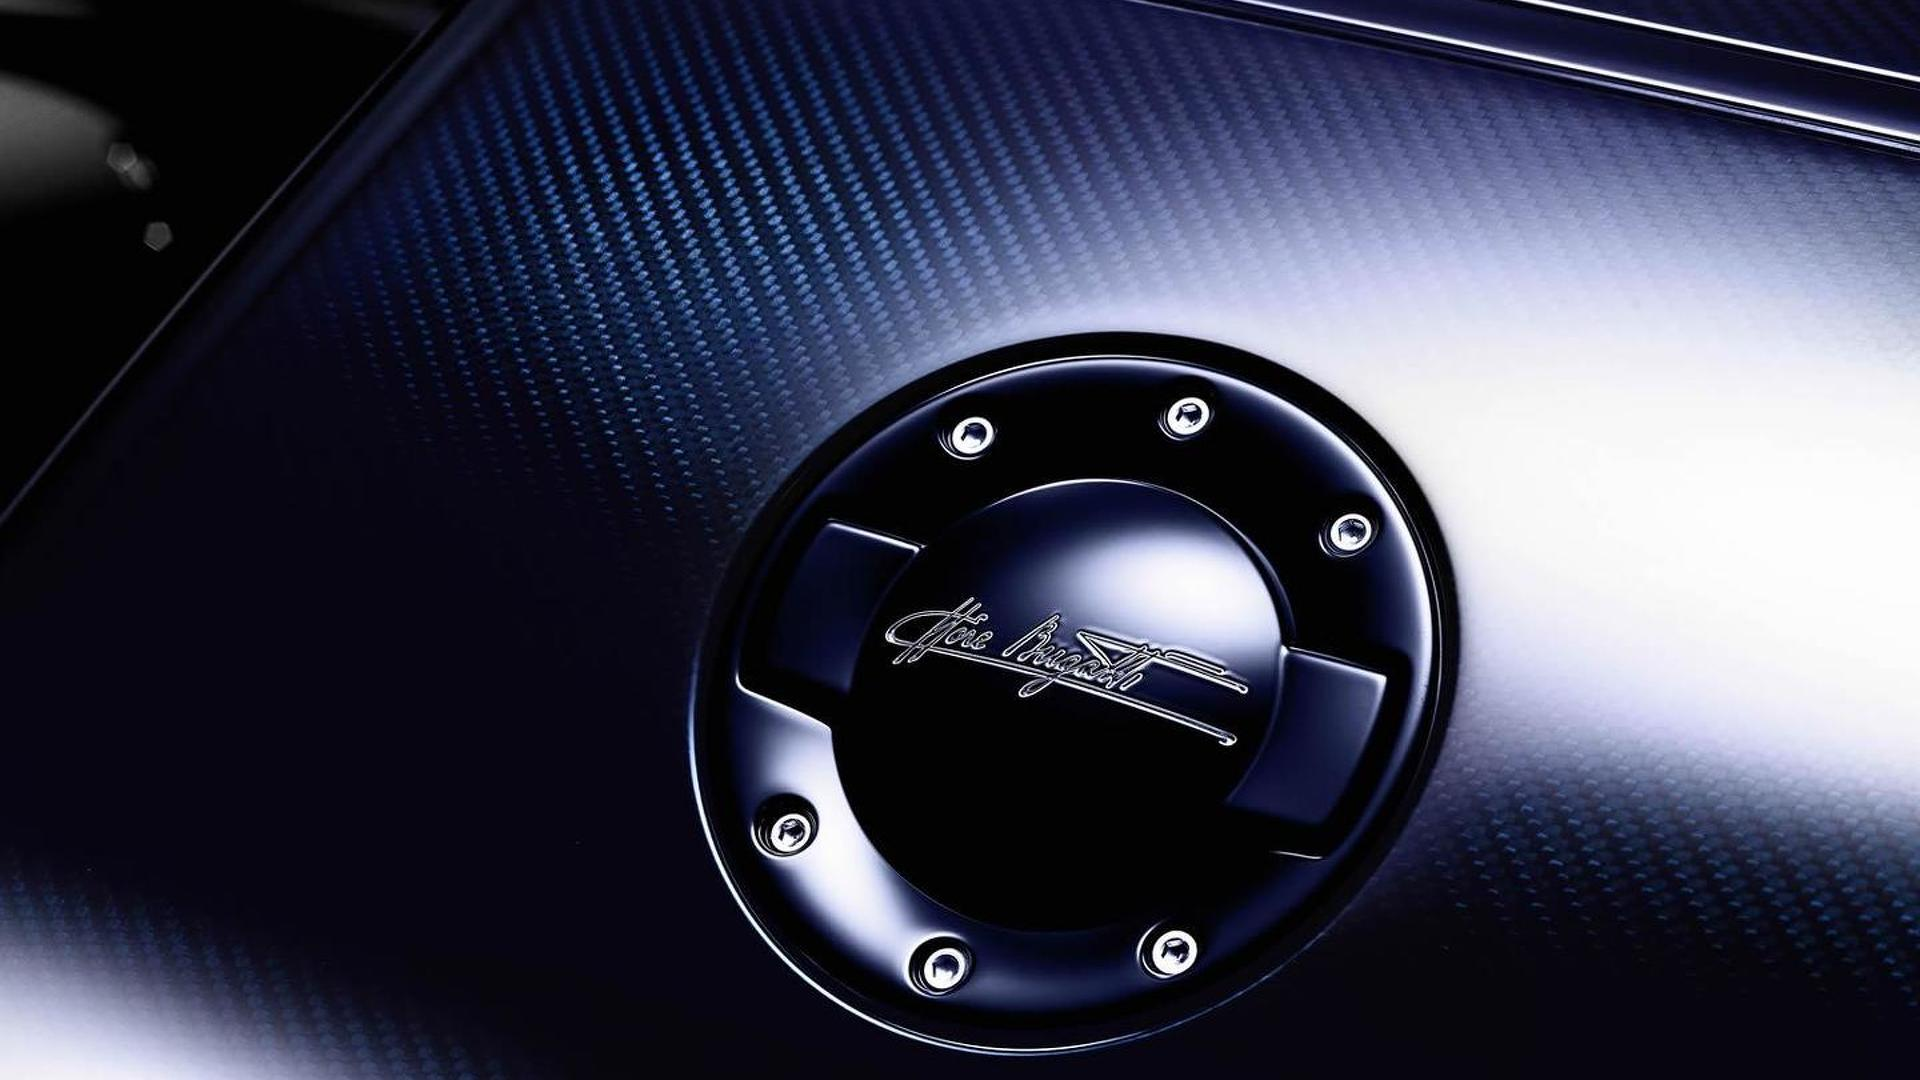 Крышка бака Bugatti Veyron Ettore Bugatti Edition